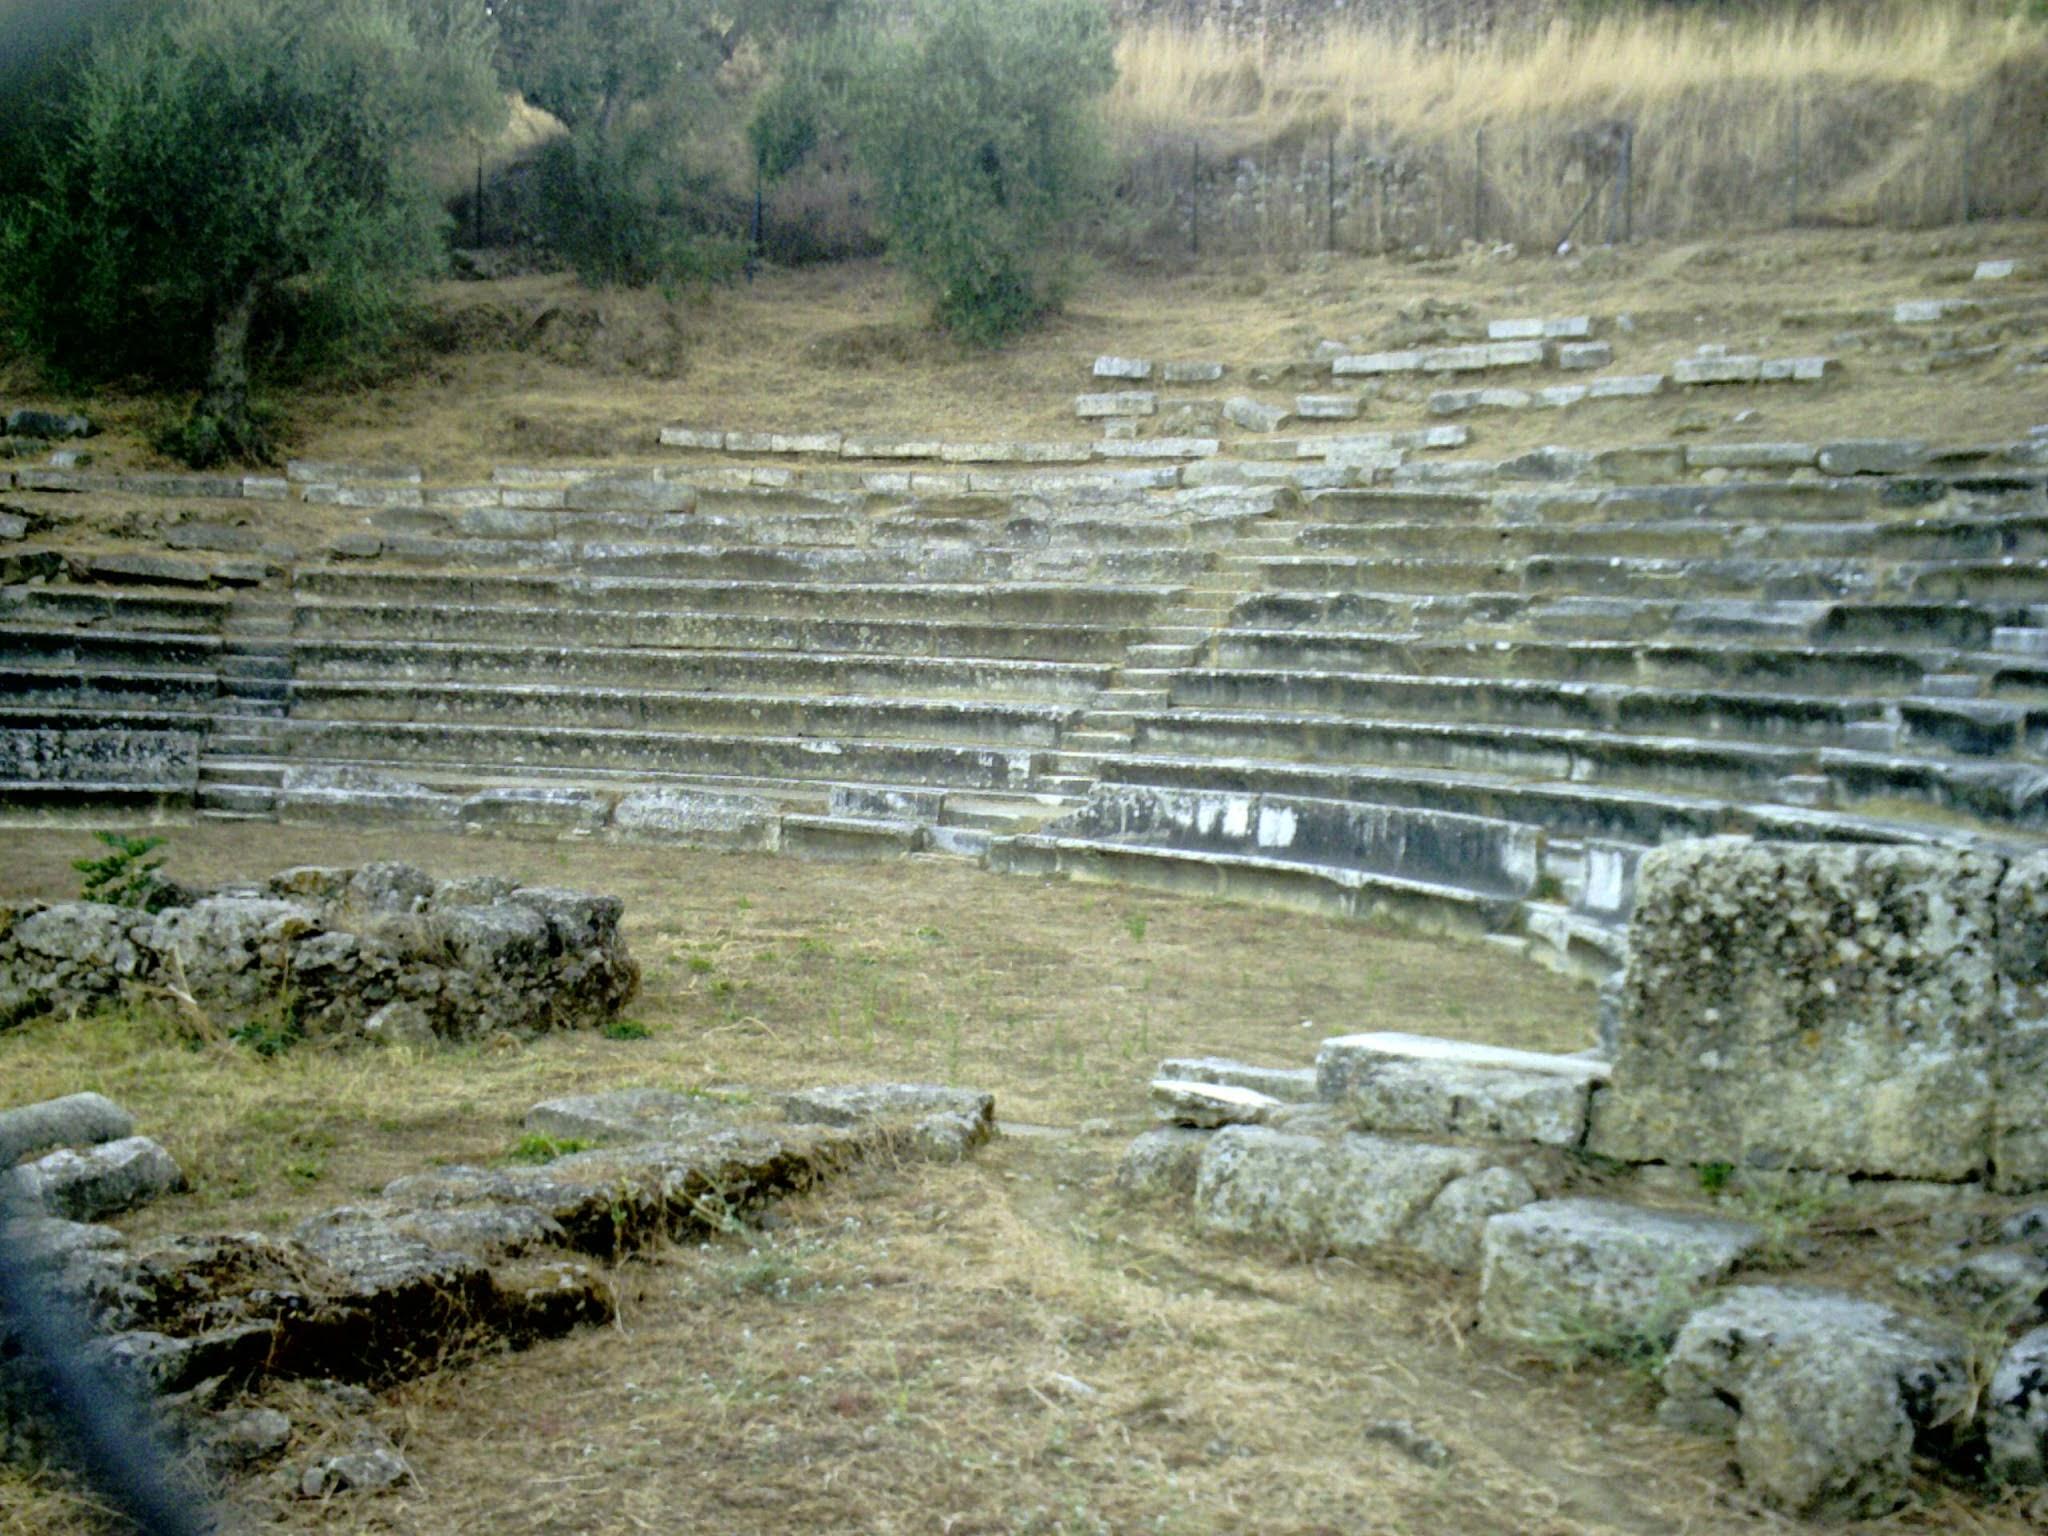 Gythio, Península de Mani, Pelopones, Grecia, Teatre romà